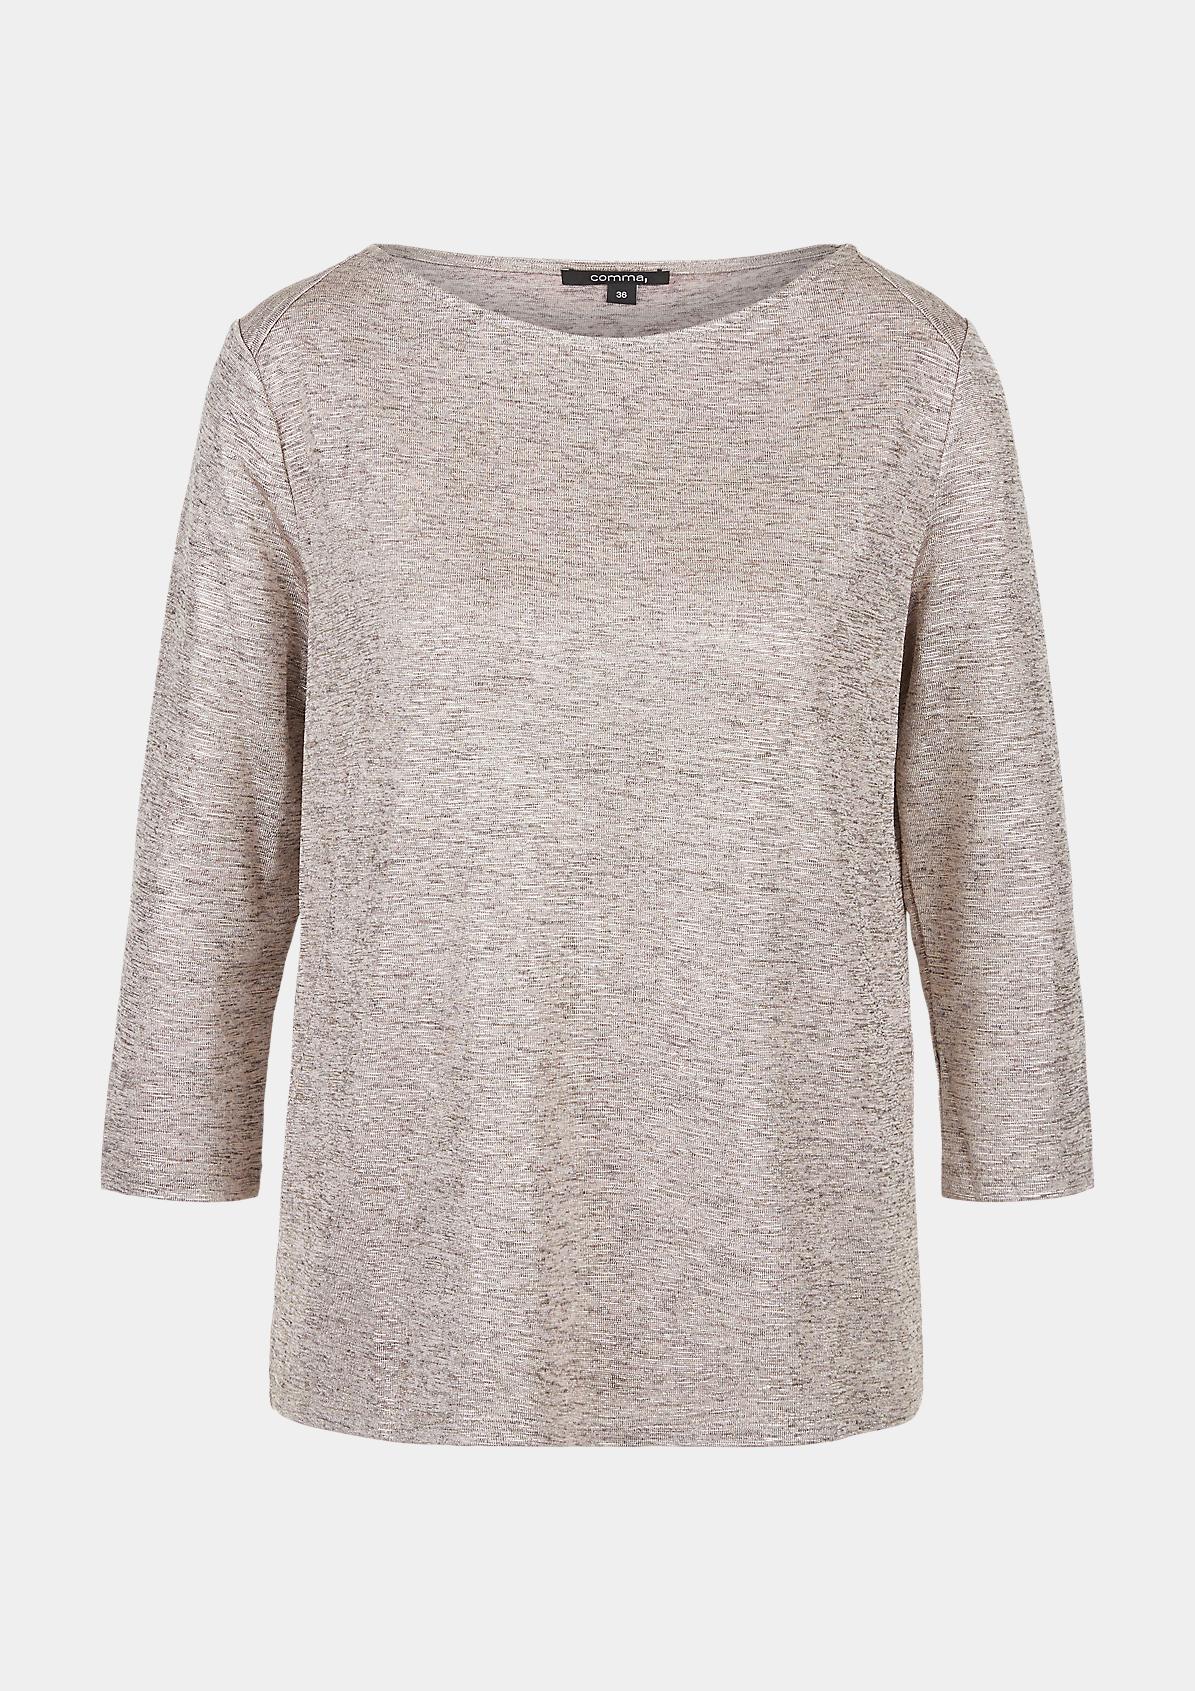 Shirt mit Metallic-Effekt